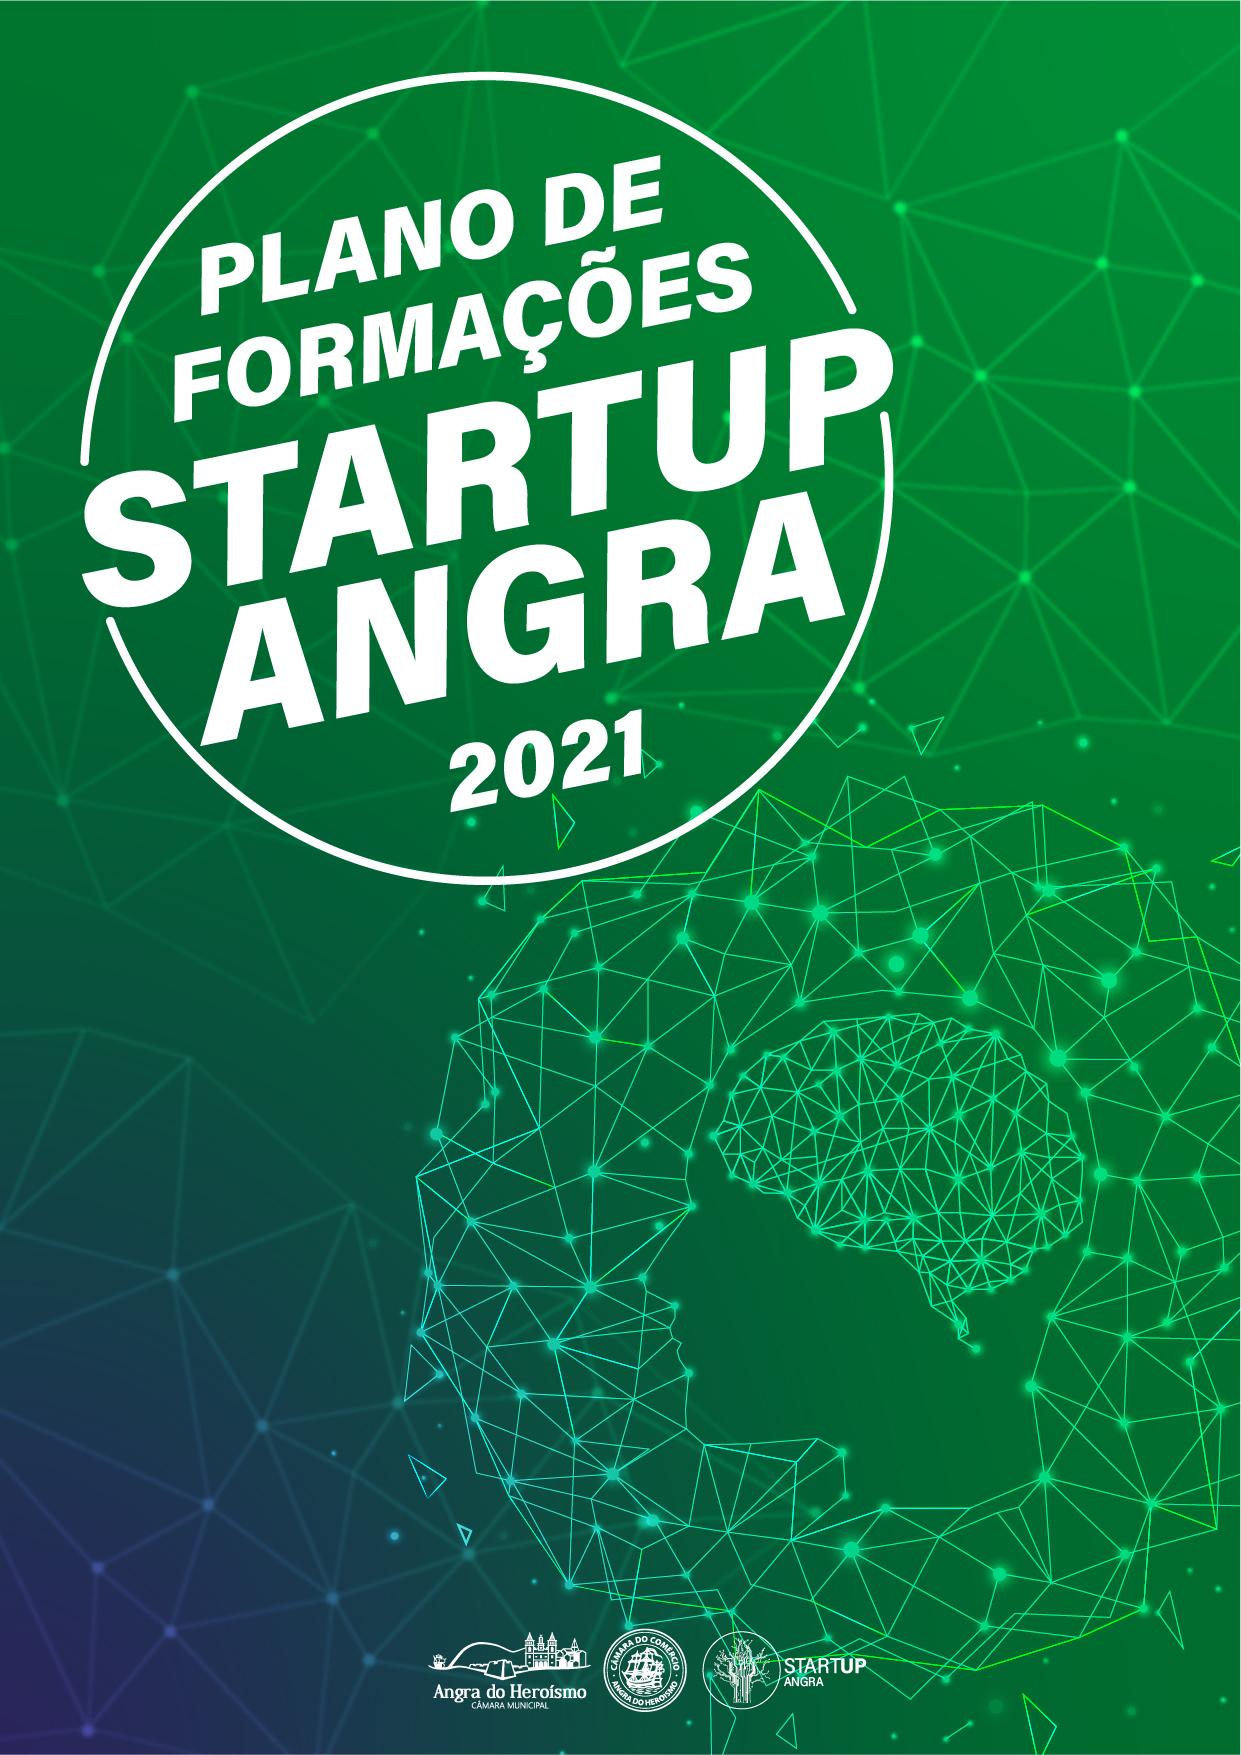 http://www.startupangra.com/wp-content/uploads/2021/03/grafismo_poster-geral.jpg